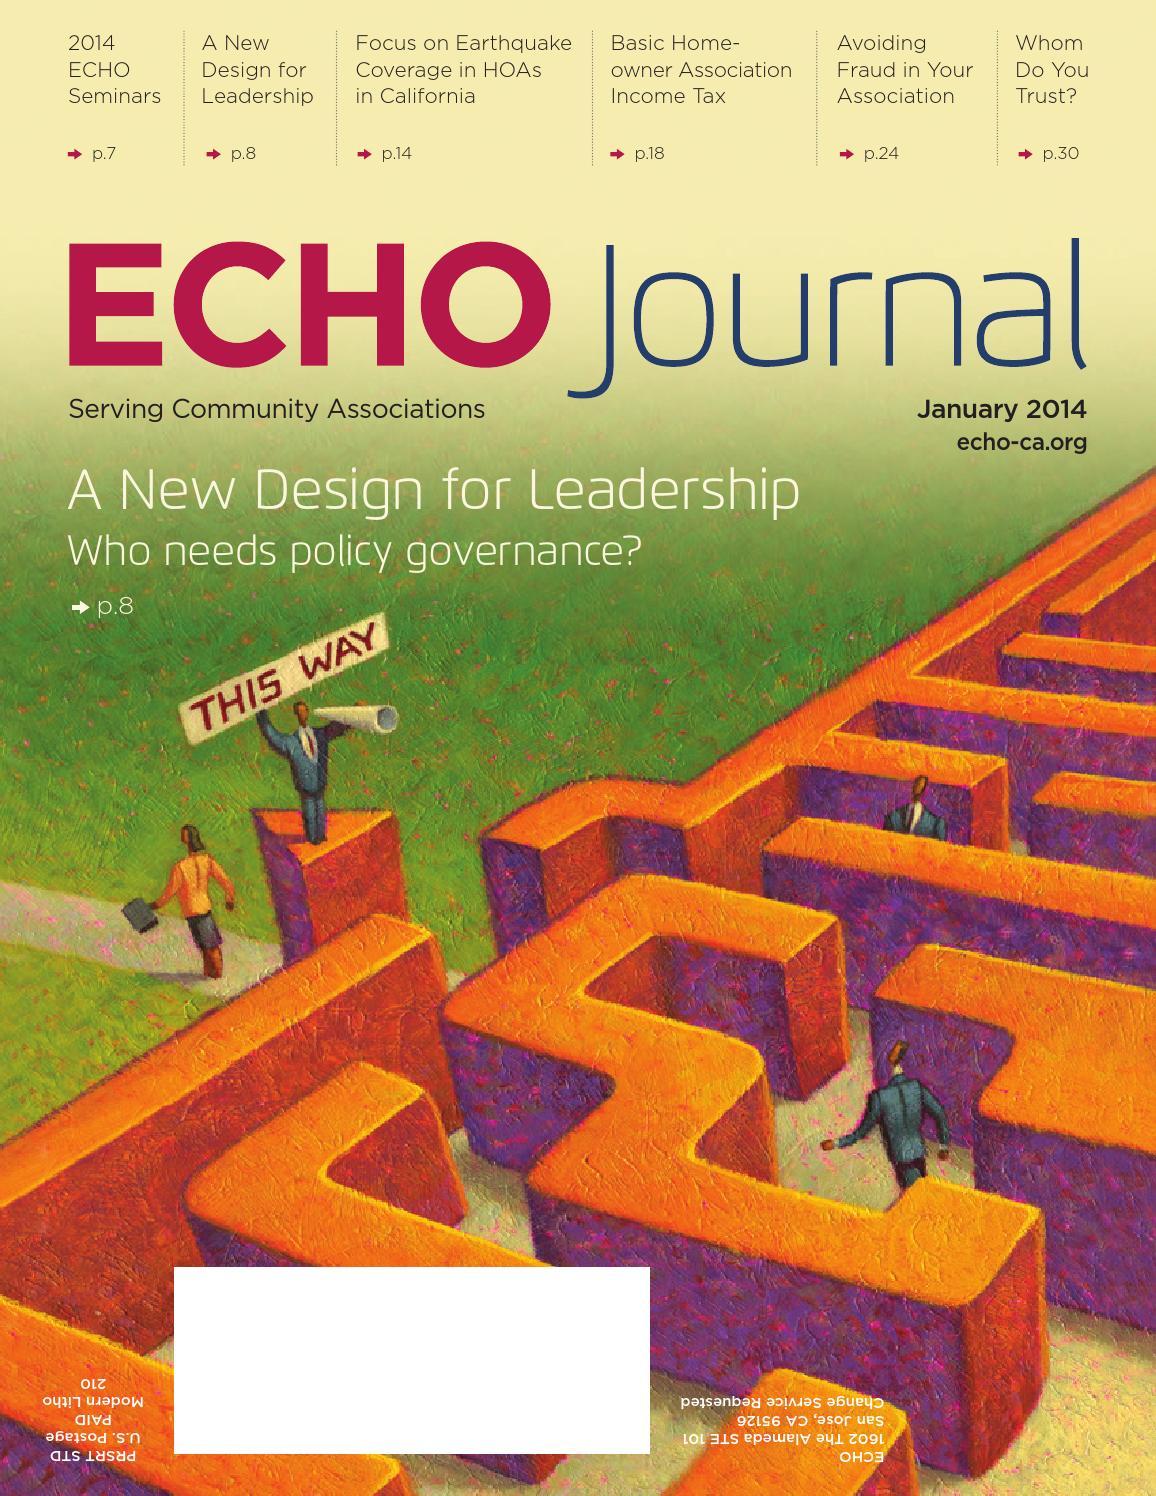 ECHO Journal - January 2014 by Echo - issuu